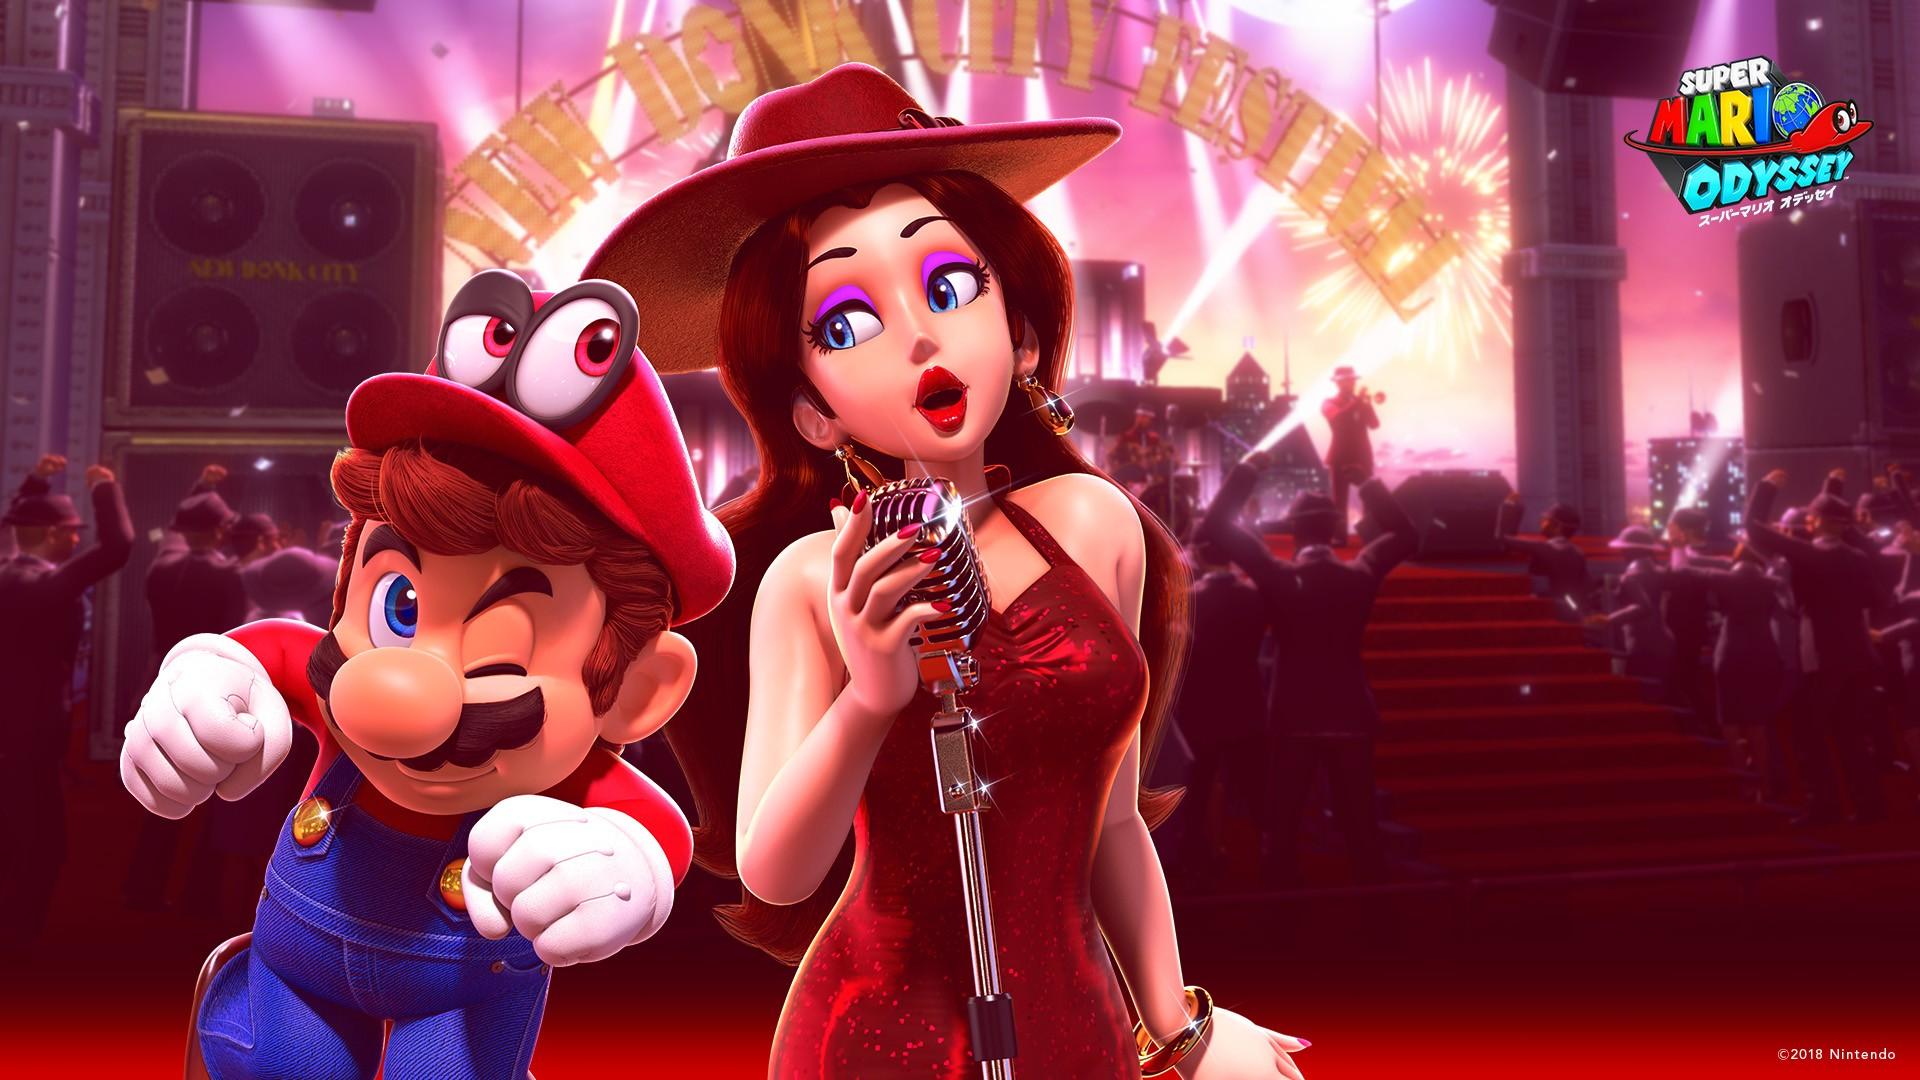 Super Mario Odyssey Wallpaper Iphone X Super Mario Odyssey Happy Birthday Wallpapers Hd